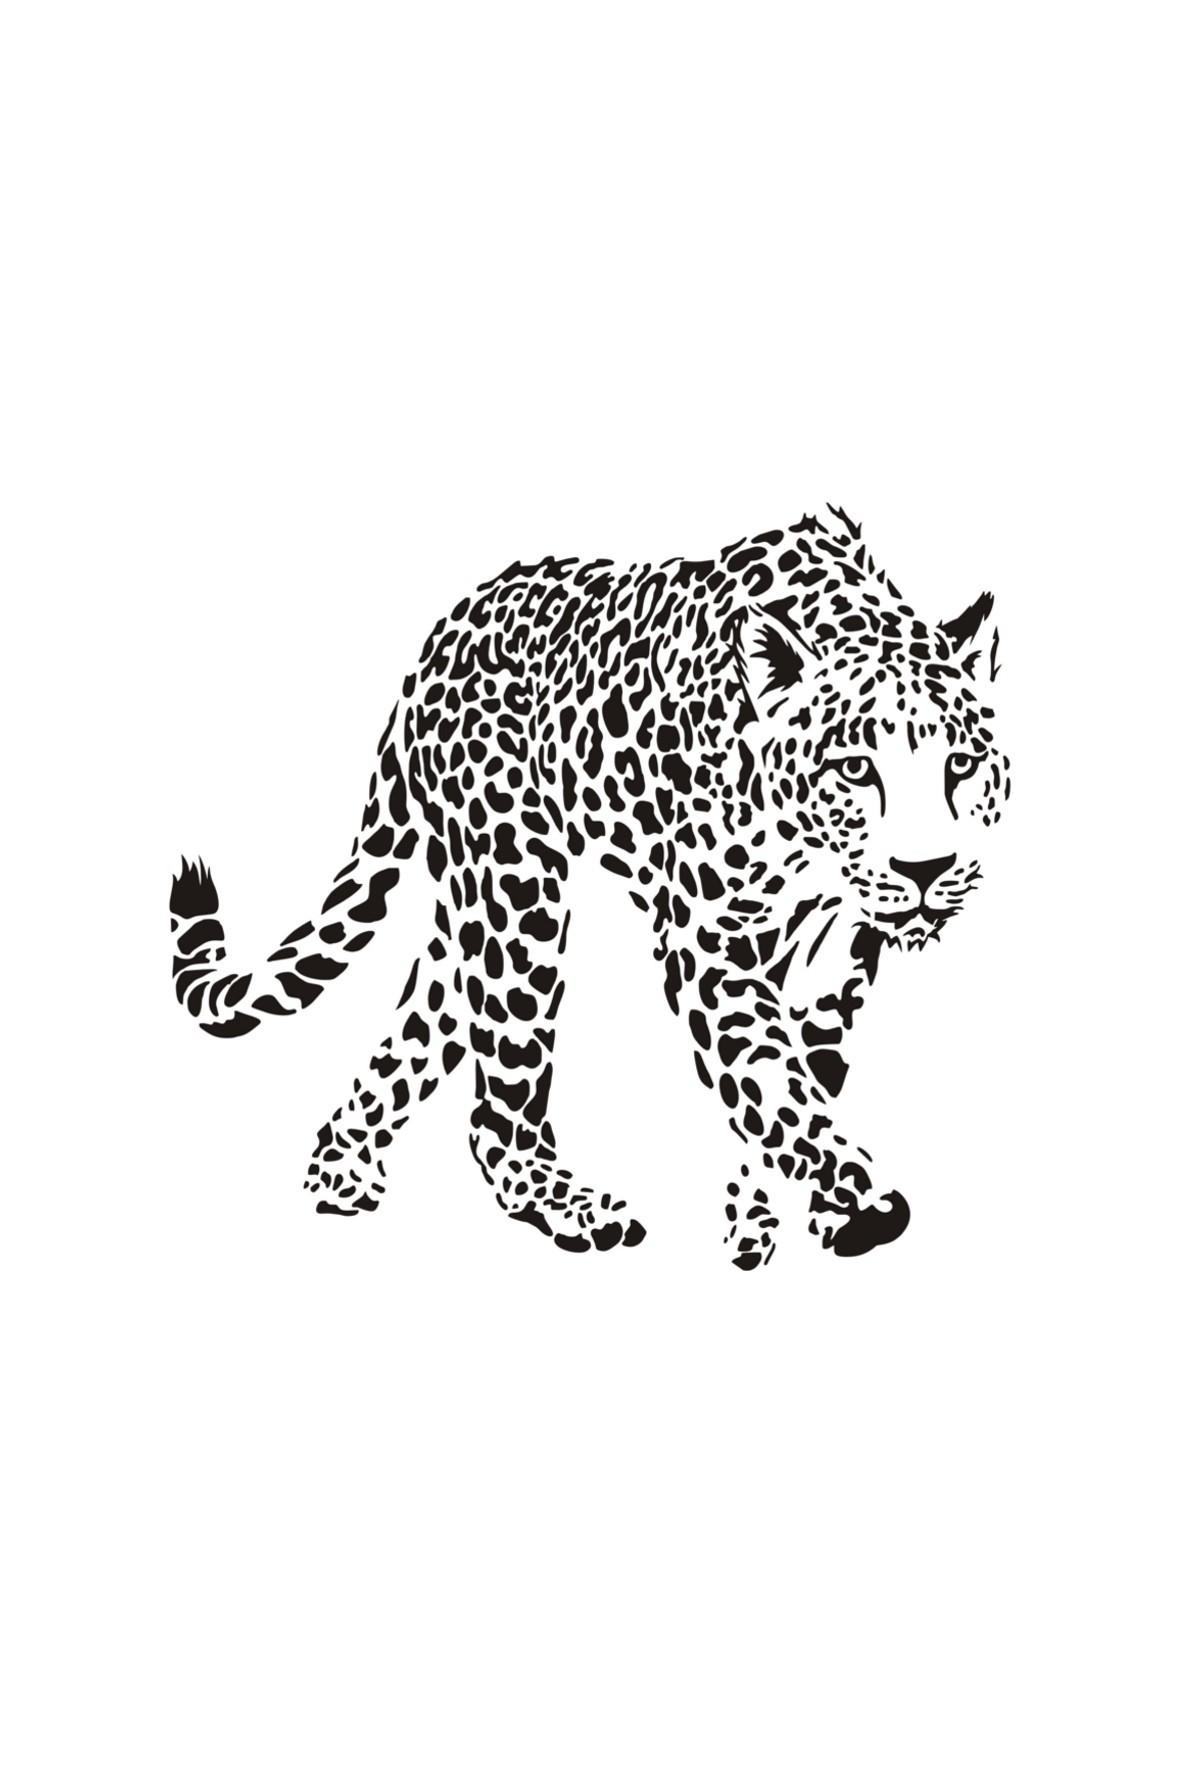 Naklejka welurowa Gepard